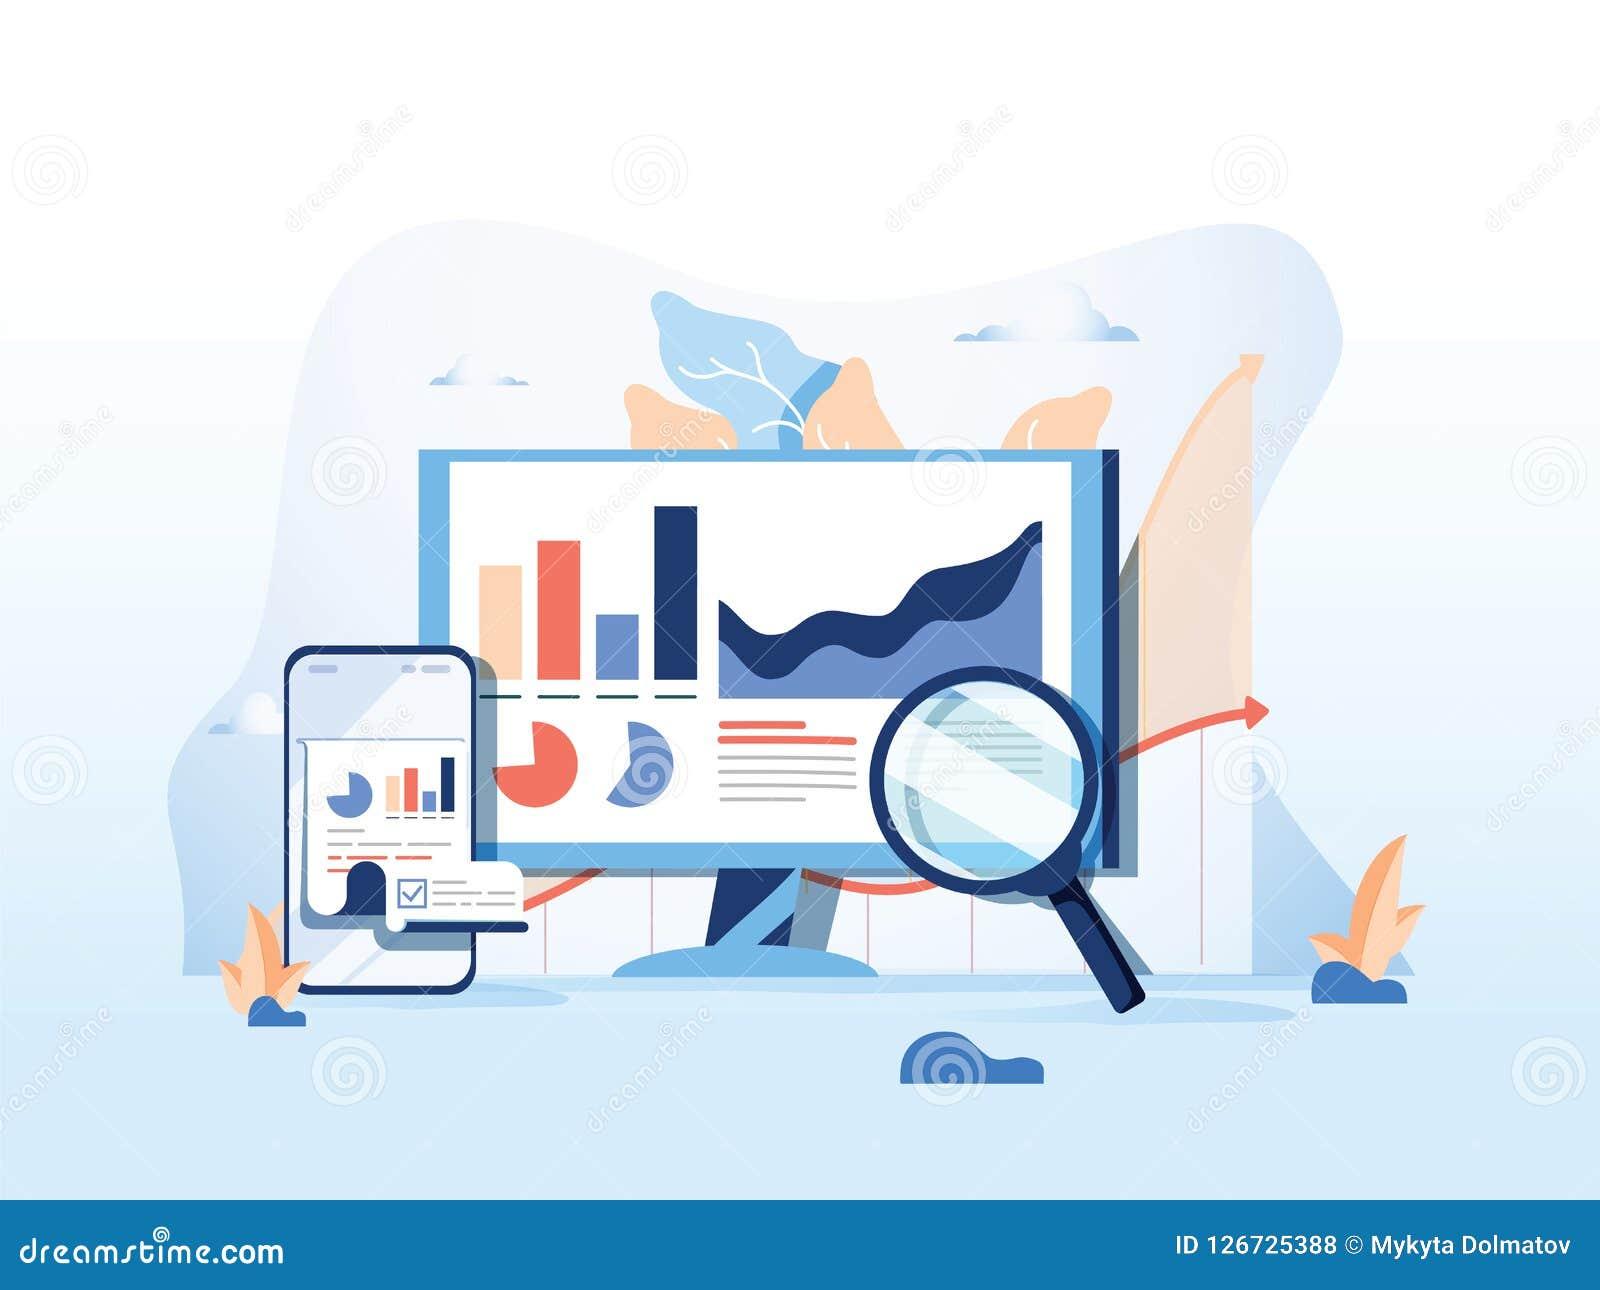 SEO που υποβάλλει έκθεση, στοιχεία που ελέγχουν, analytics κυκλοφορίας Ιστού, μεγάλη επίπεδη διανυσματική απεικόνιση στοιχείων στ